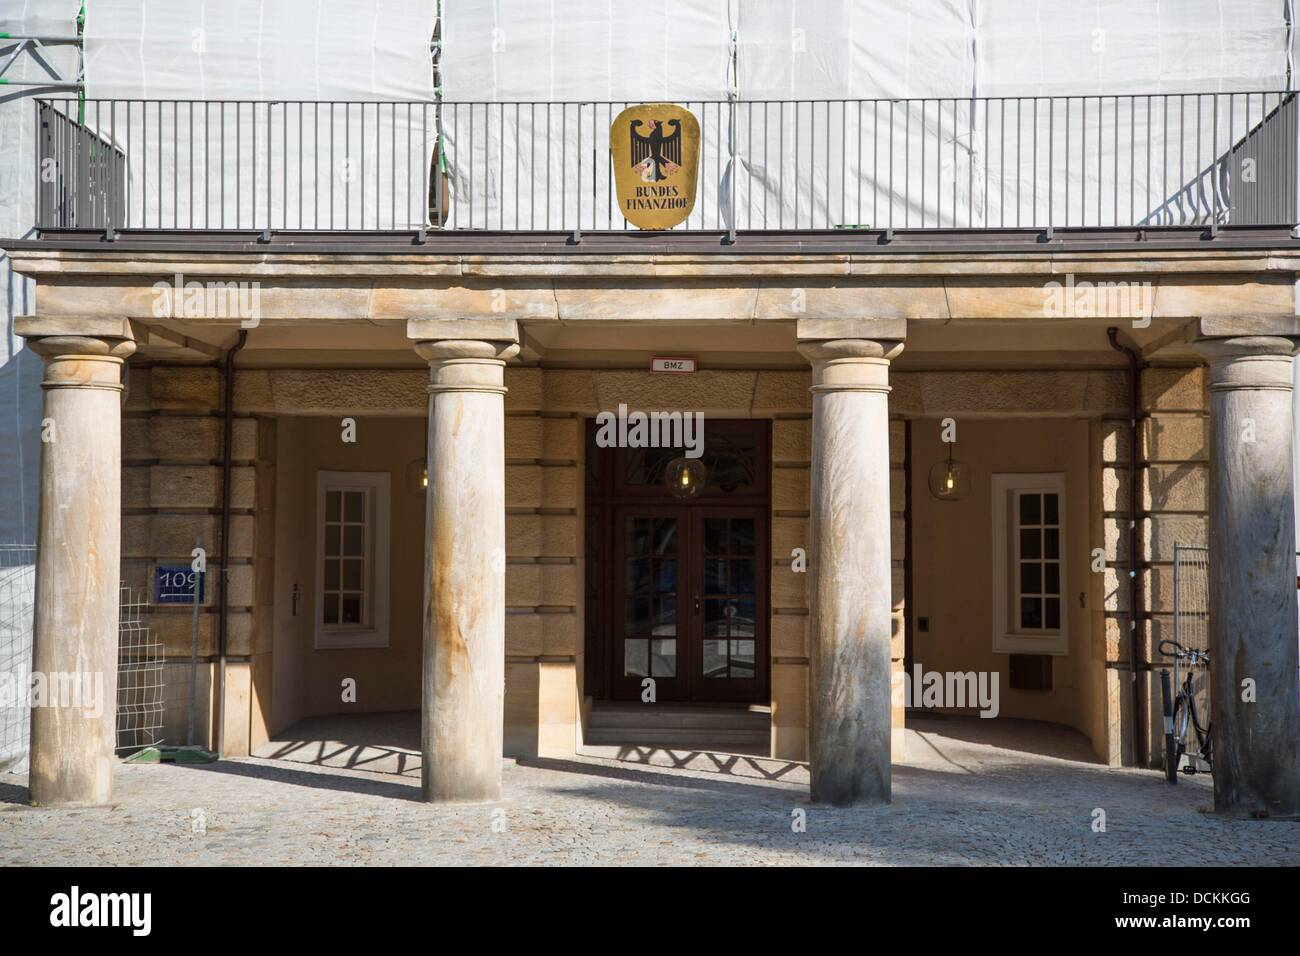 Eingang zum Bundesfinanzhof  in München, Foto: Robert B. Fishman, ecomedia, 5.7.2013 - Stock Image